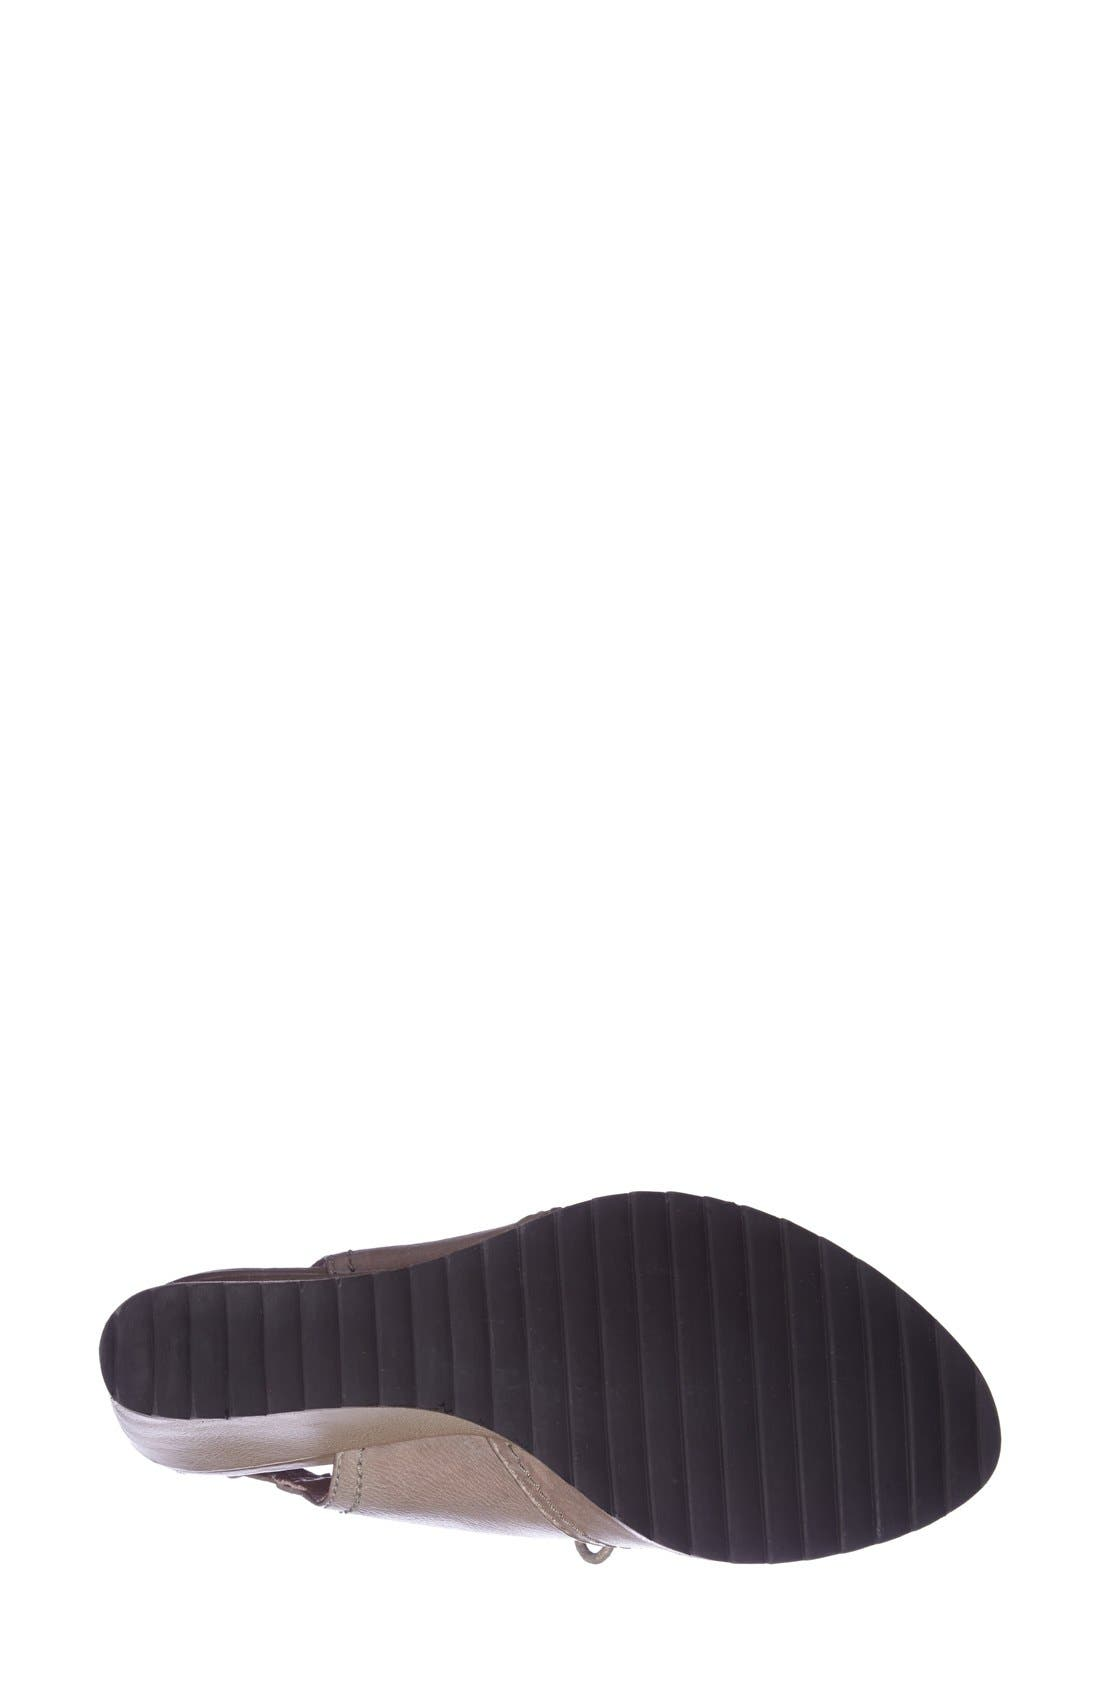 Alternate Image 4  - Biala 'Bayley' Wedge Sandal (Women)